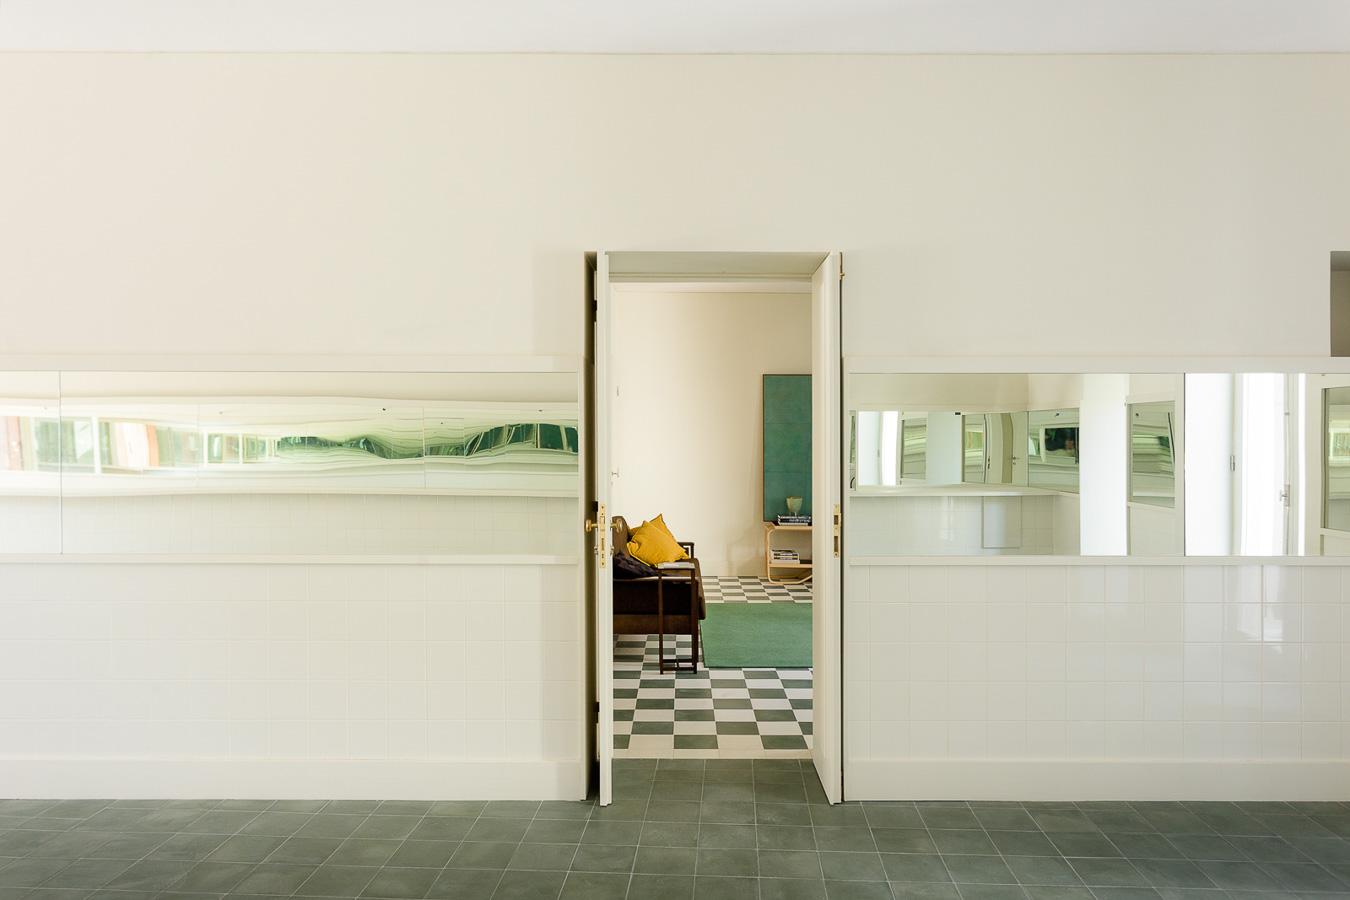 Arquitecta Luisa Souto Moura | Hotel Duas Portas